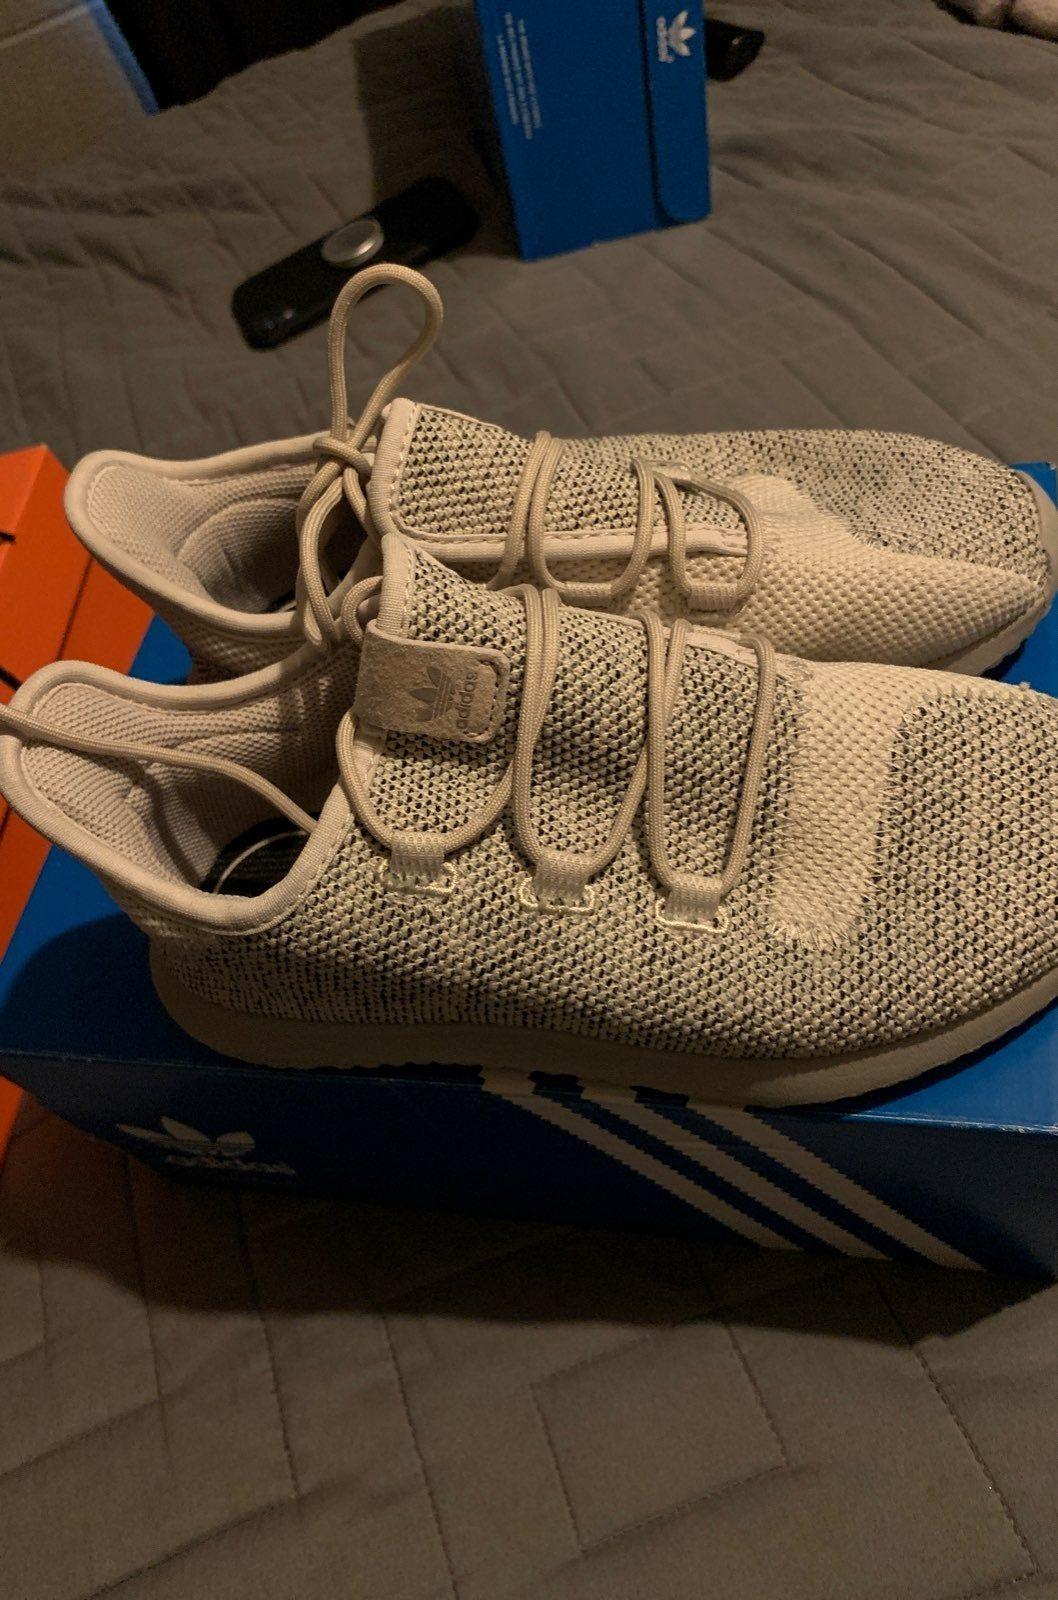 Adidas ortholite , oatmeal color , Kids